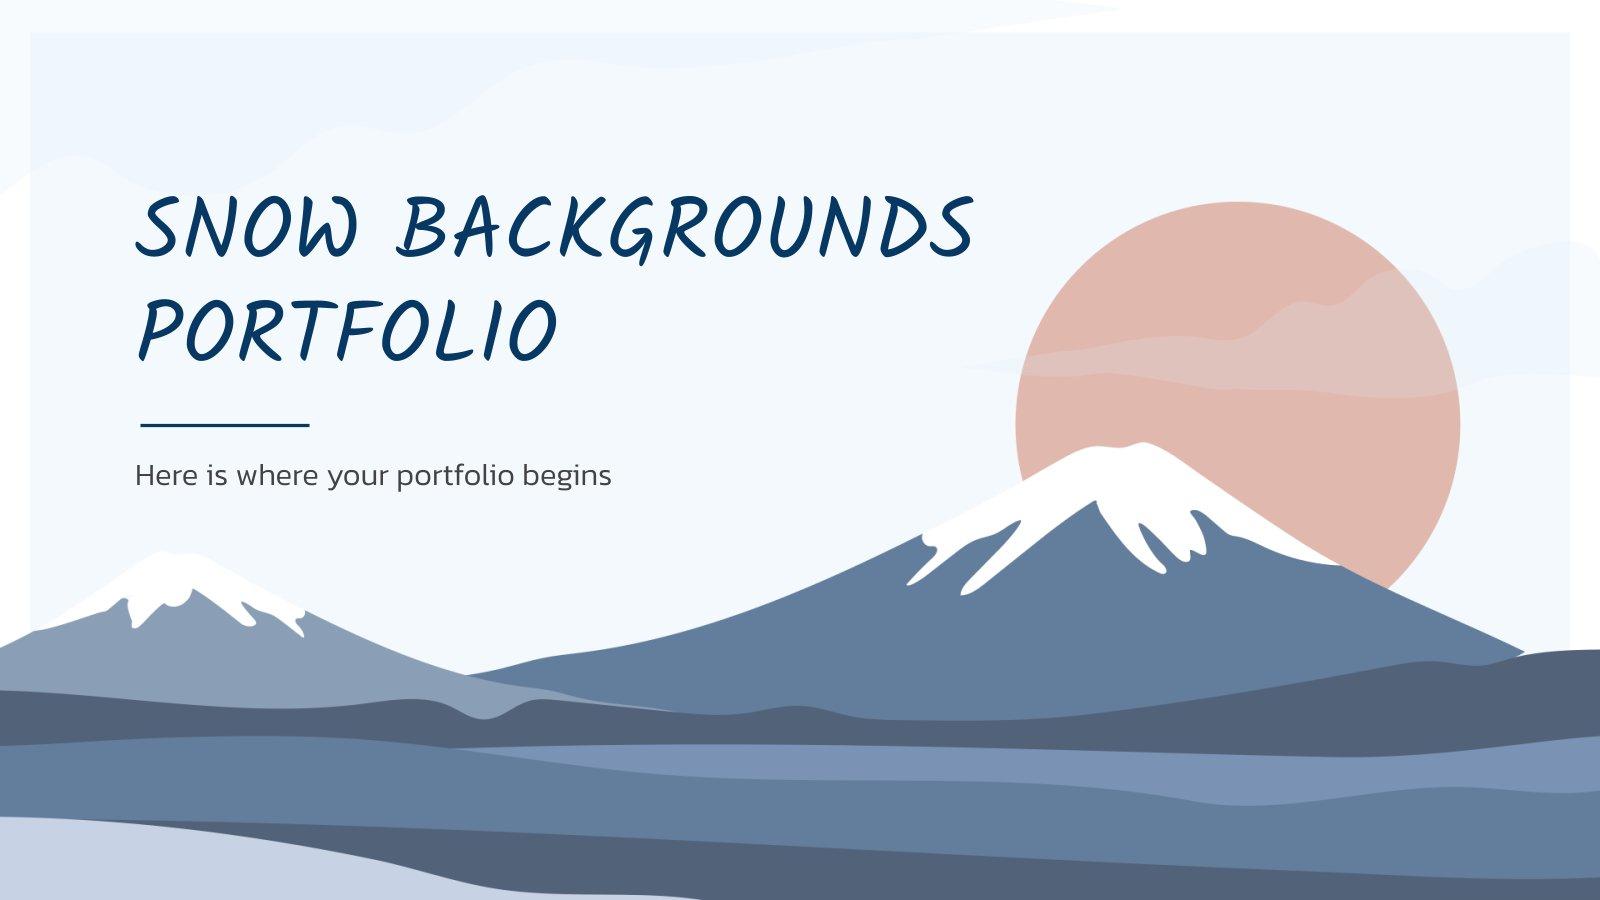 Snow Backgrounds Portfolio presentation template